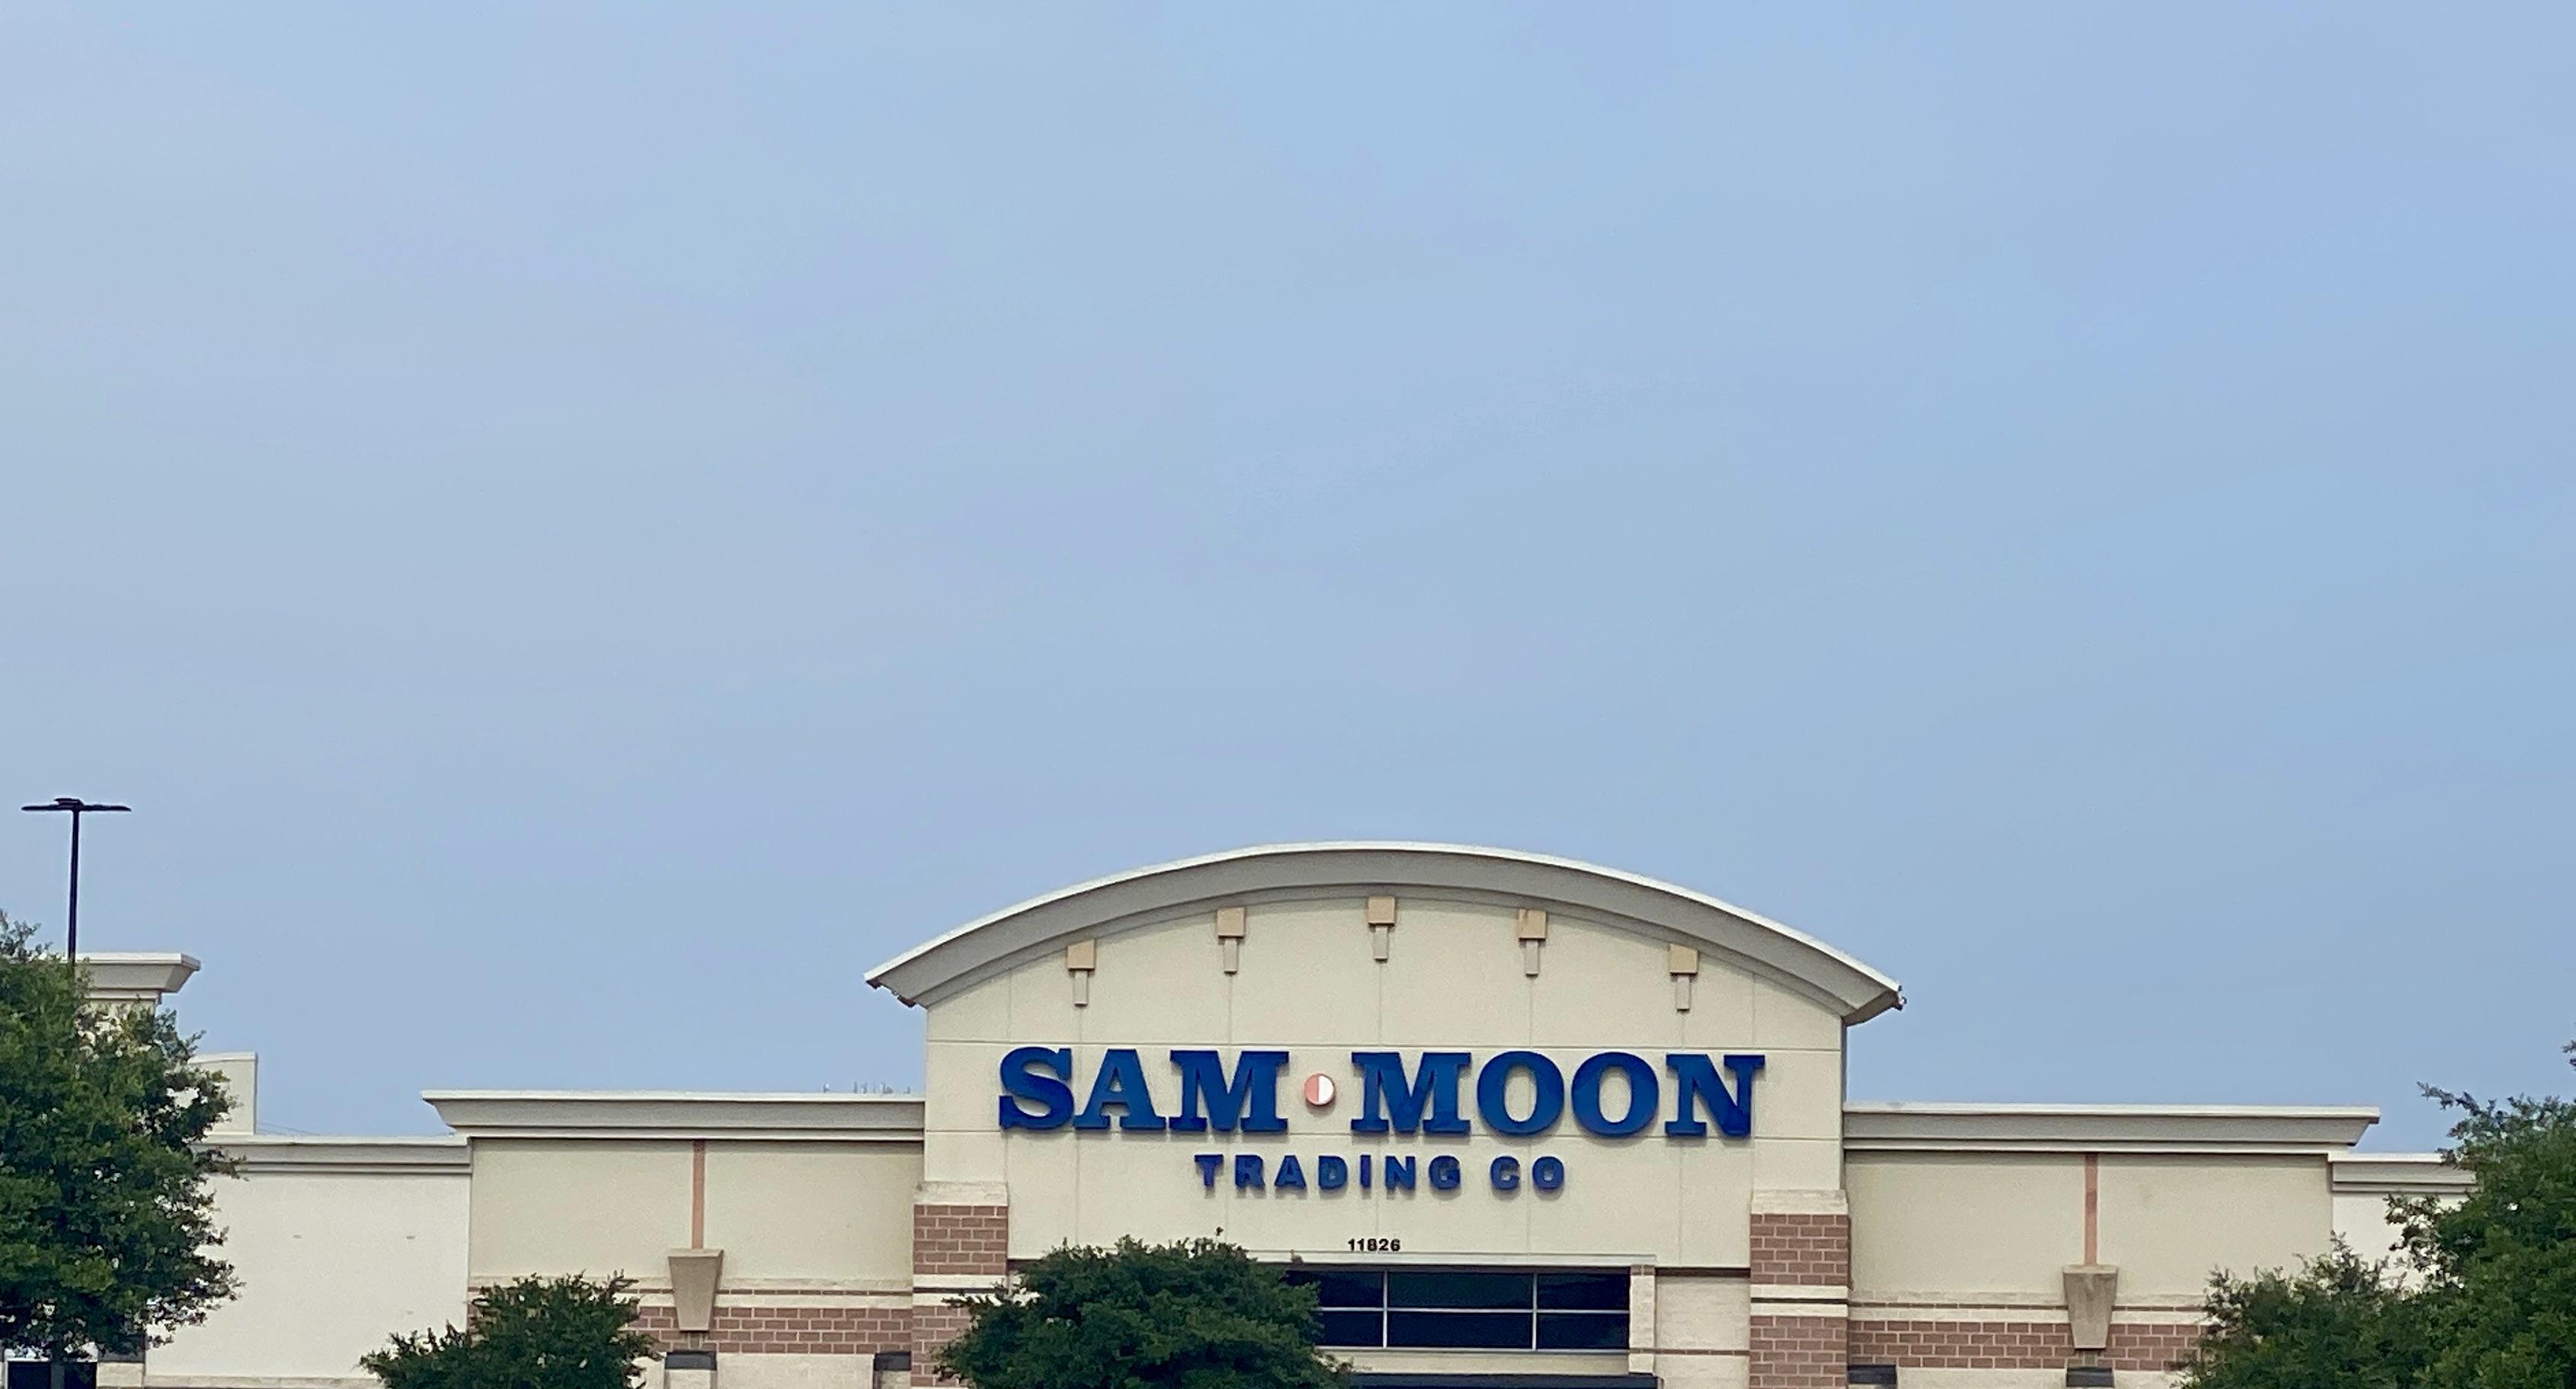 Sam Moon Trading Co in Northwest Dallas